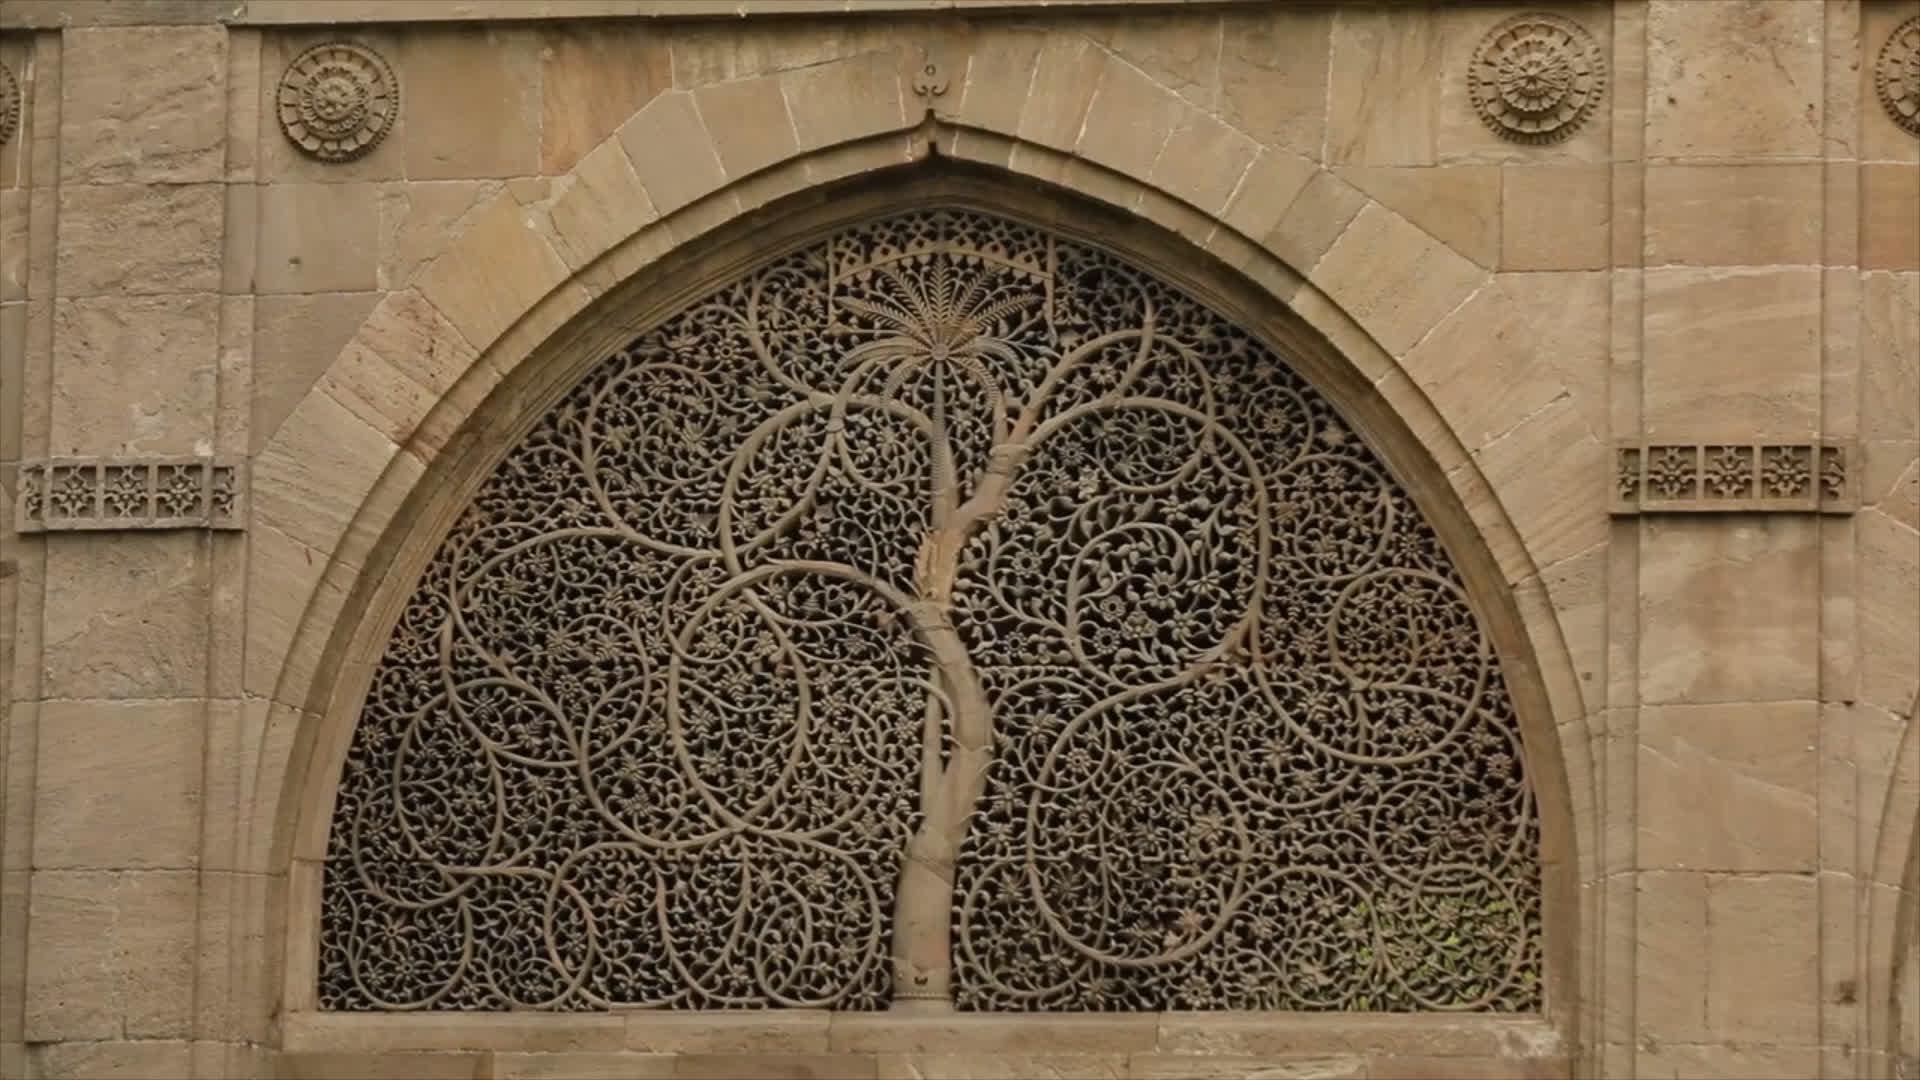 Ahmedabad's Sidi Saiyyed Mosque